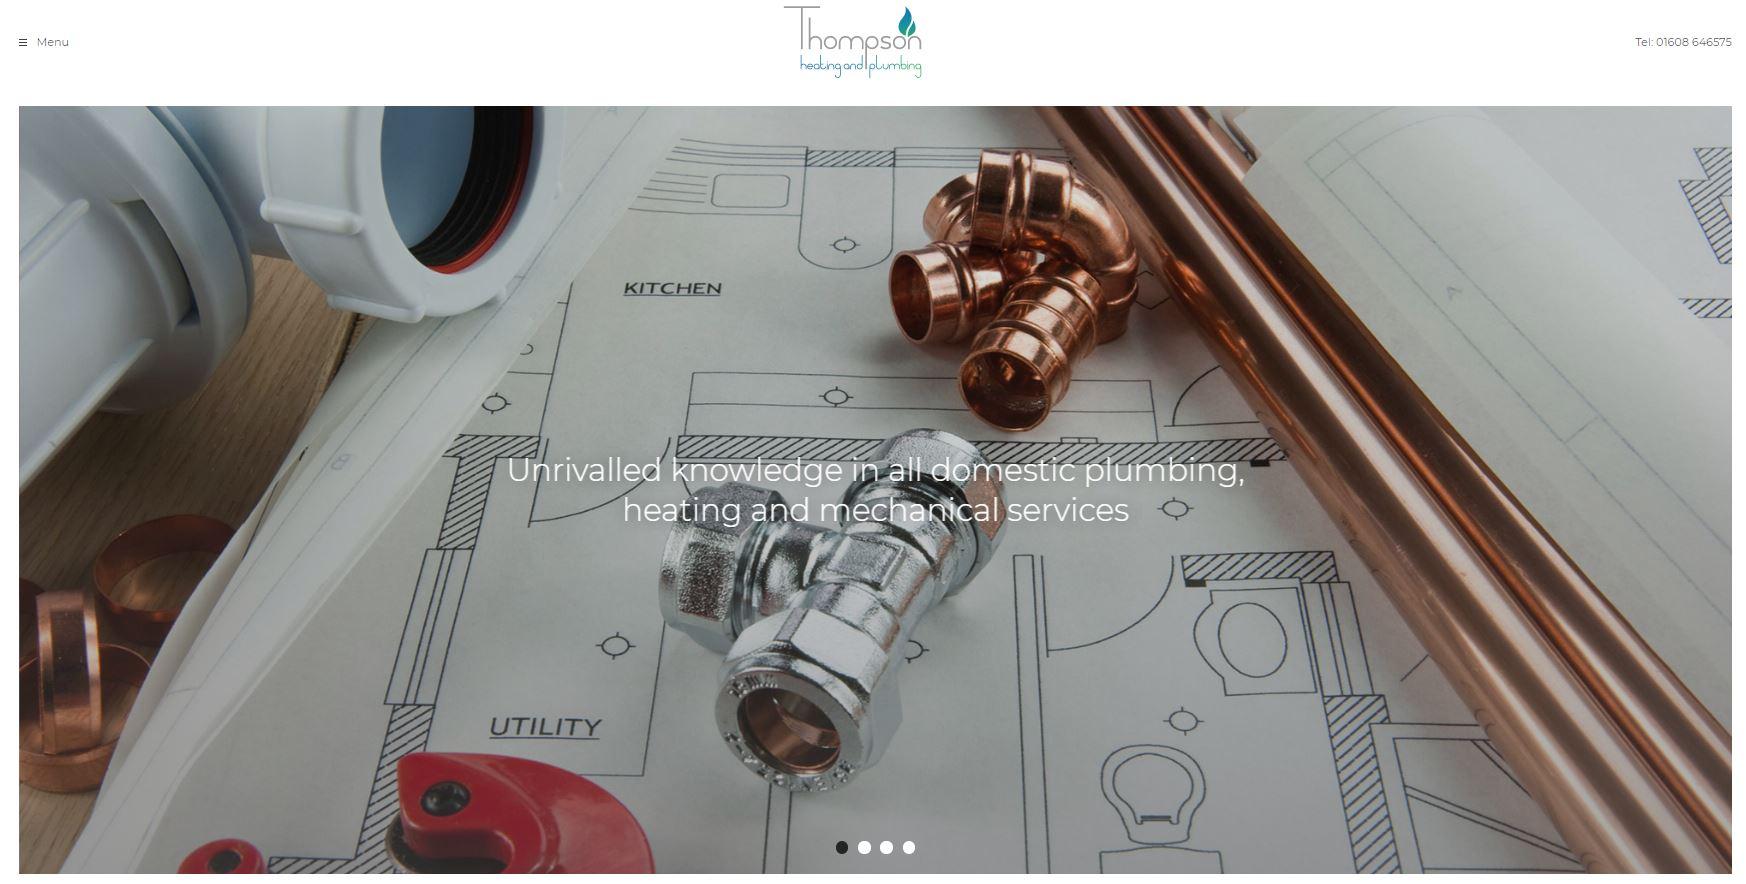 Thompson heating and plumbing website screenshot